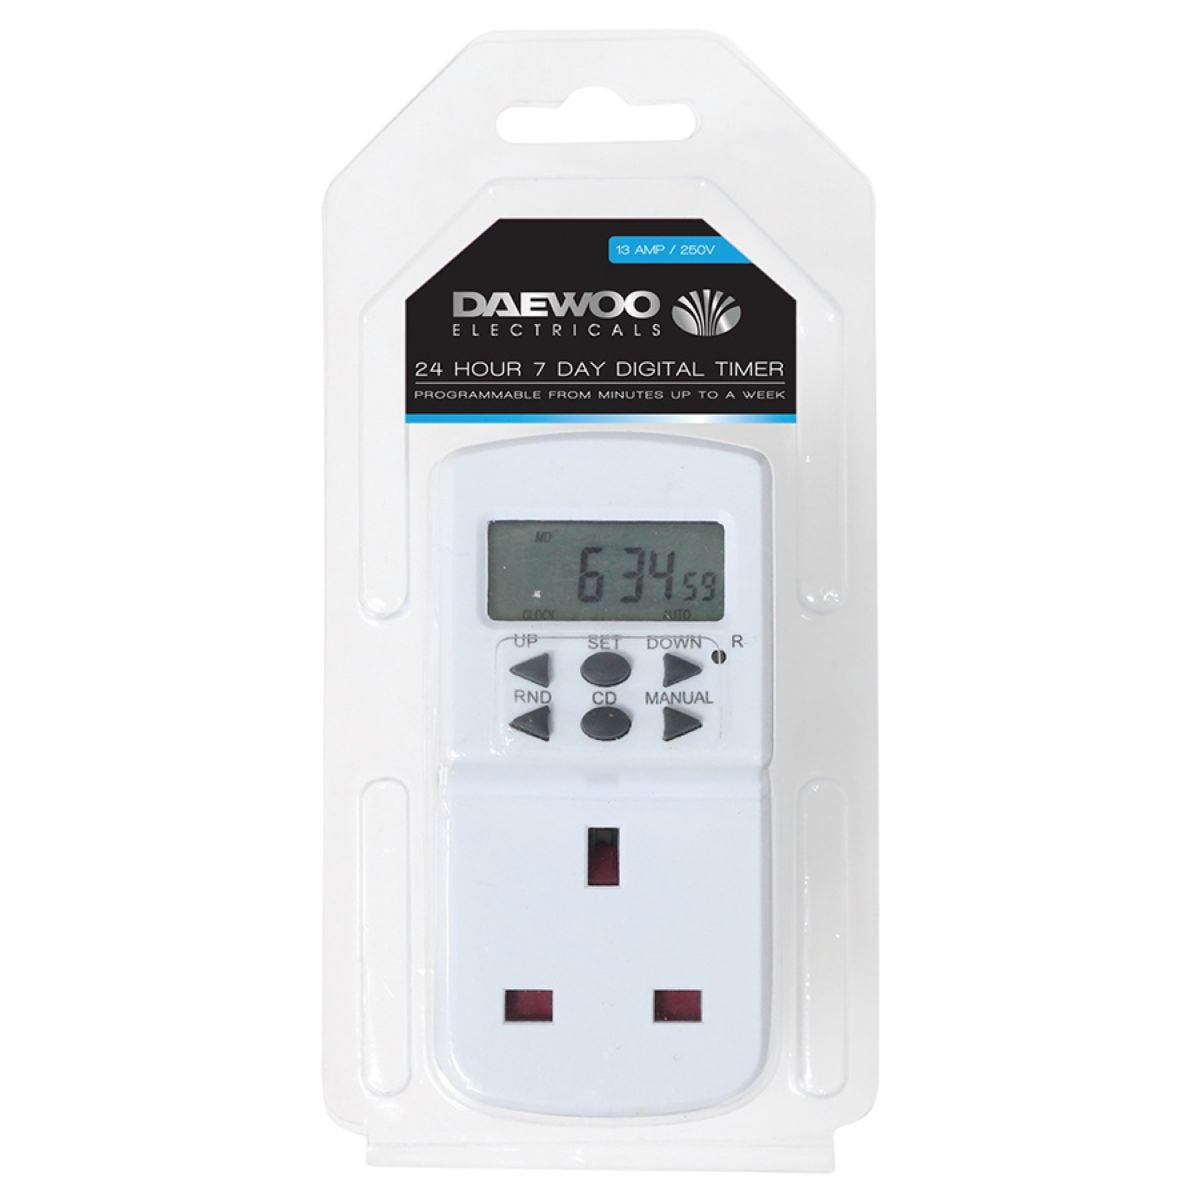 Daewoo 24/7 Digital Timer - 13 Amp